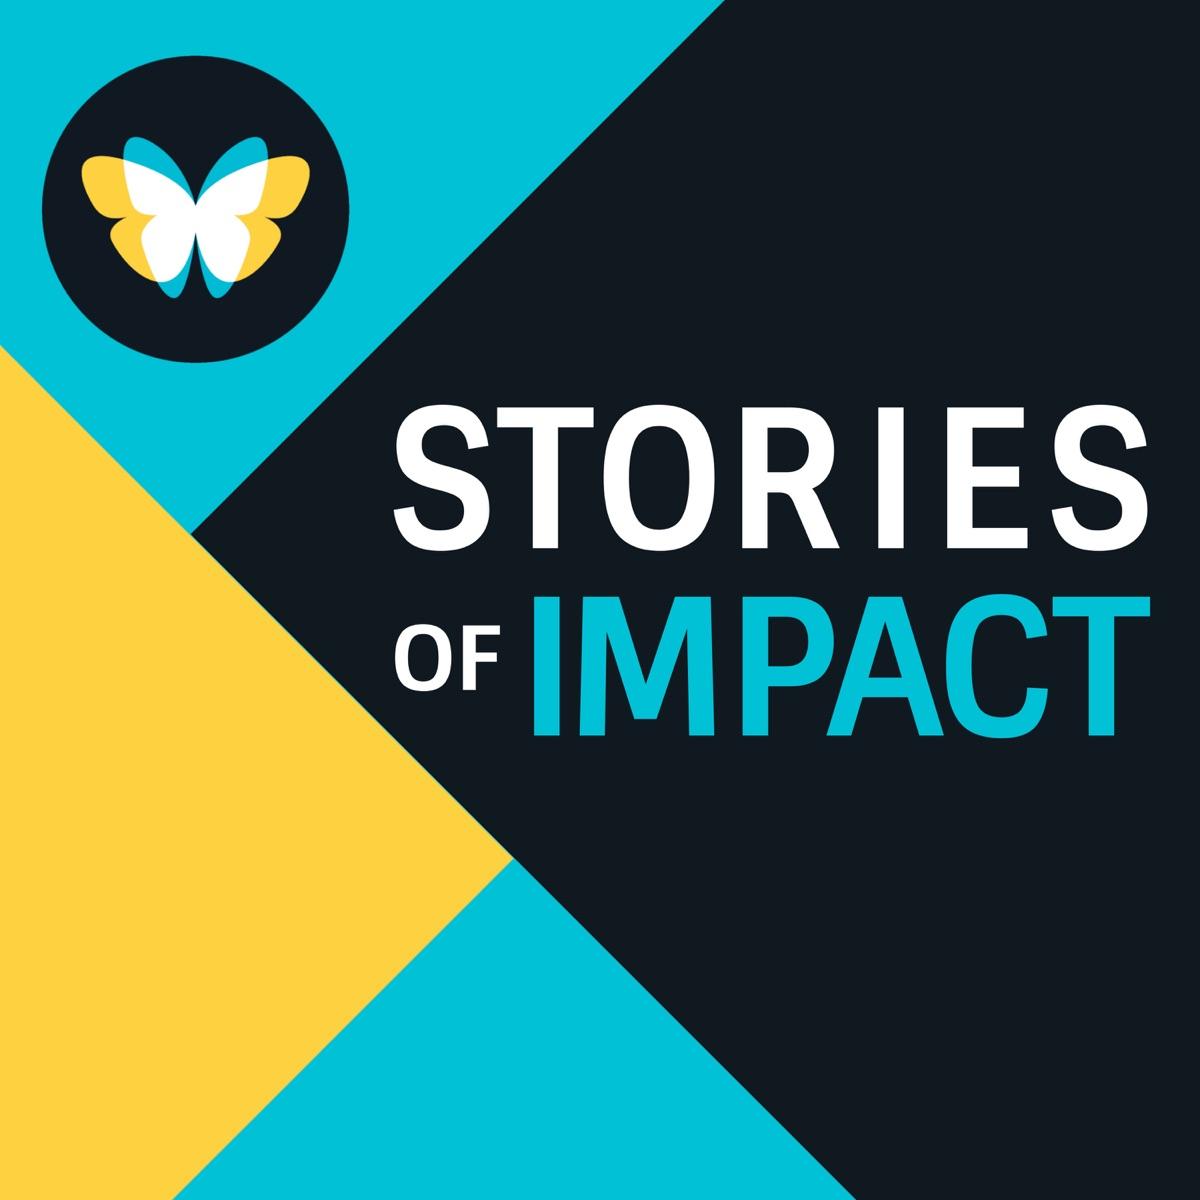 Stories of Impact